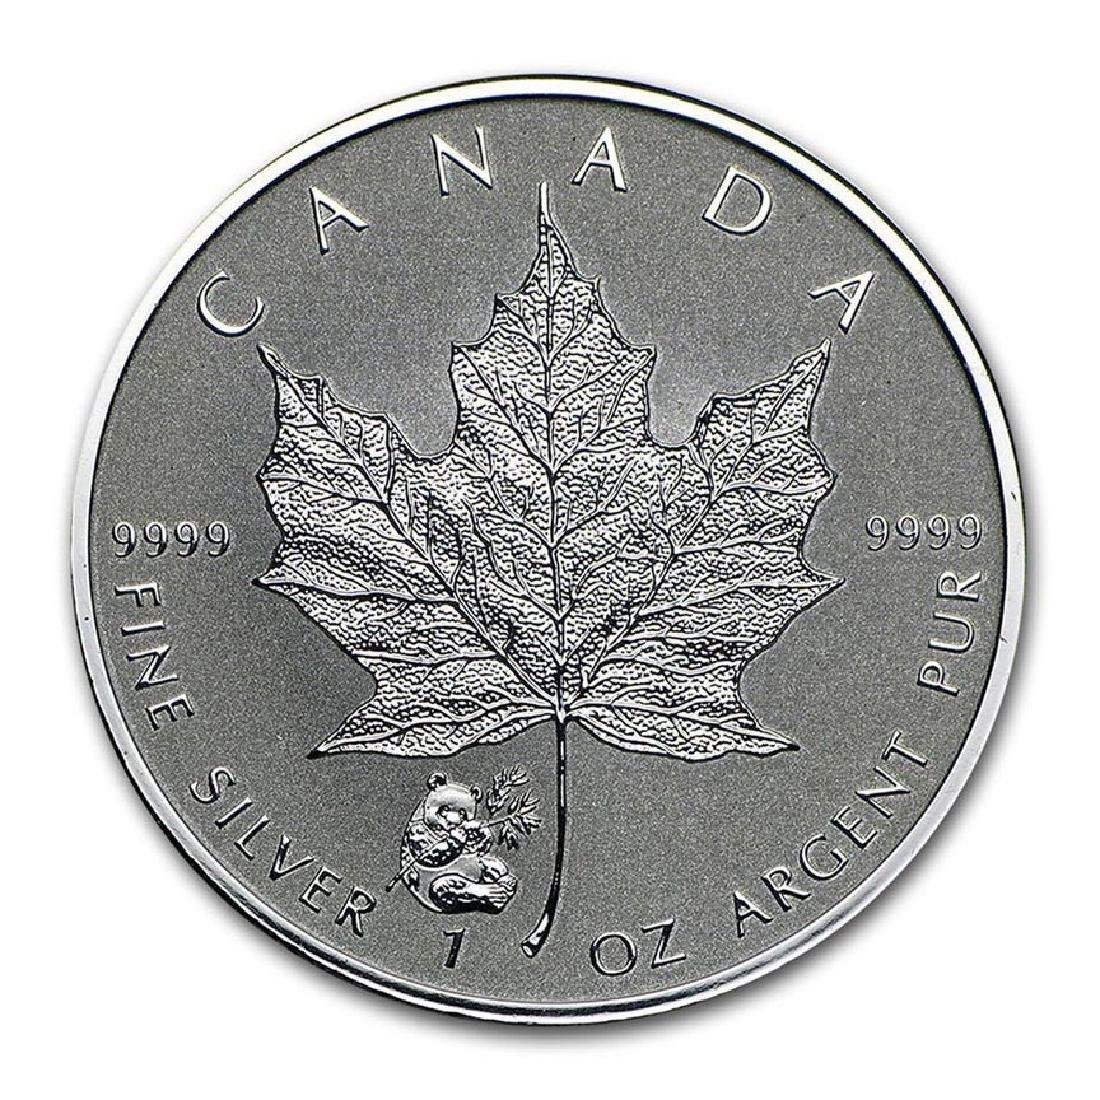 2016 Canada 1 oz. Silver Maple Leaf Reverse Proof Panda